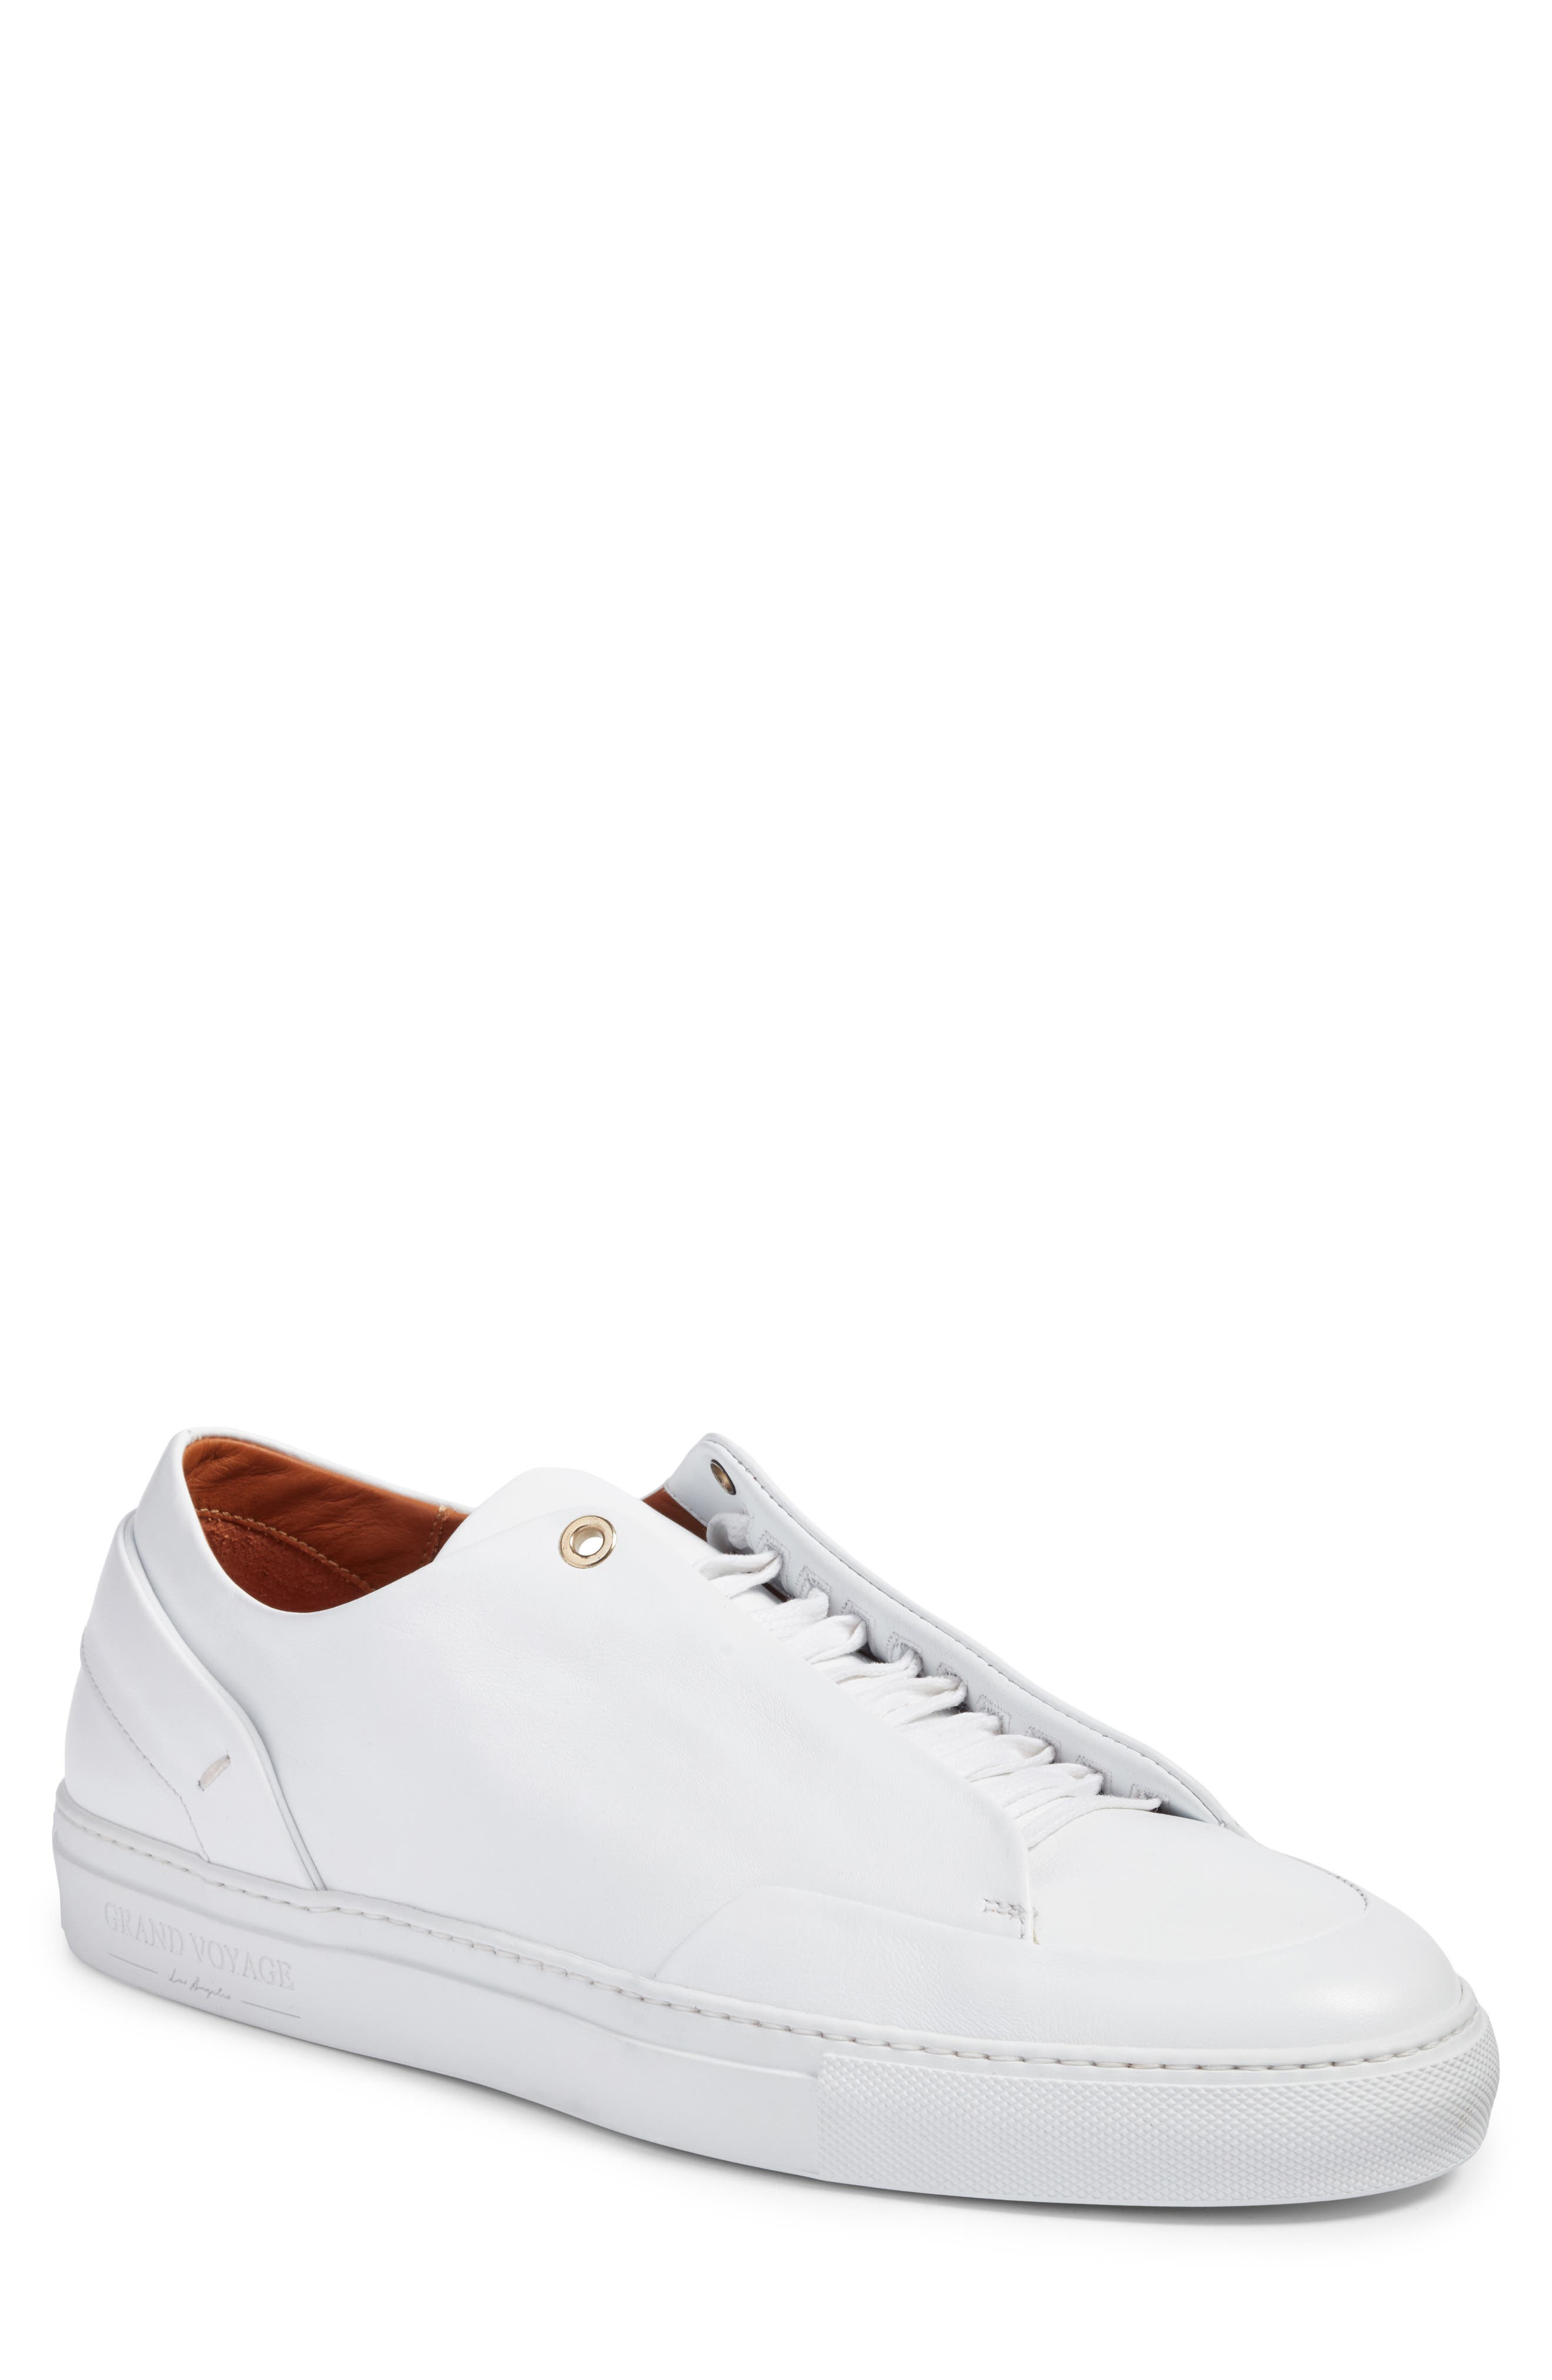 Alternate Image 1 Selected - Grand Voyage Avedon Sneaker (Men)